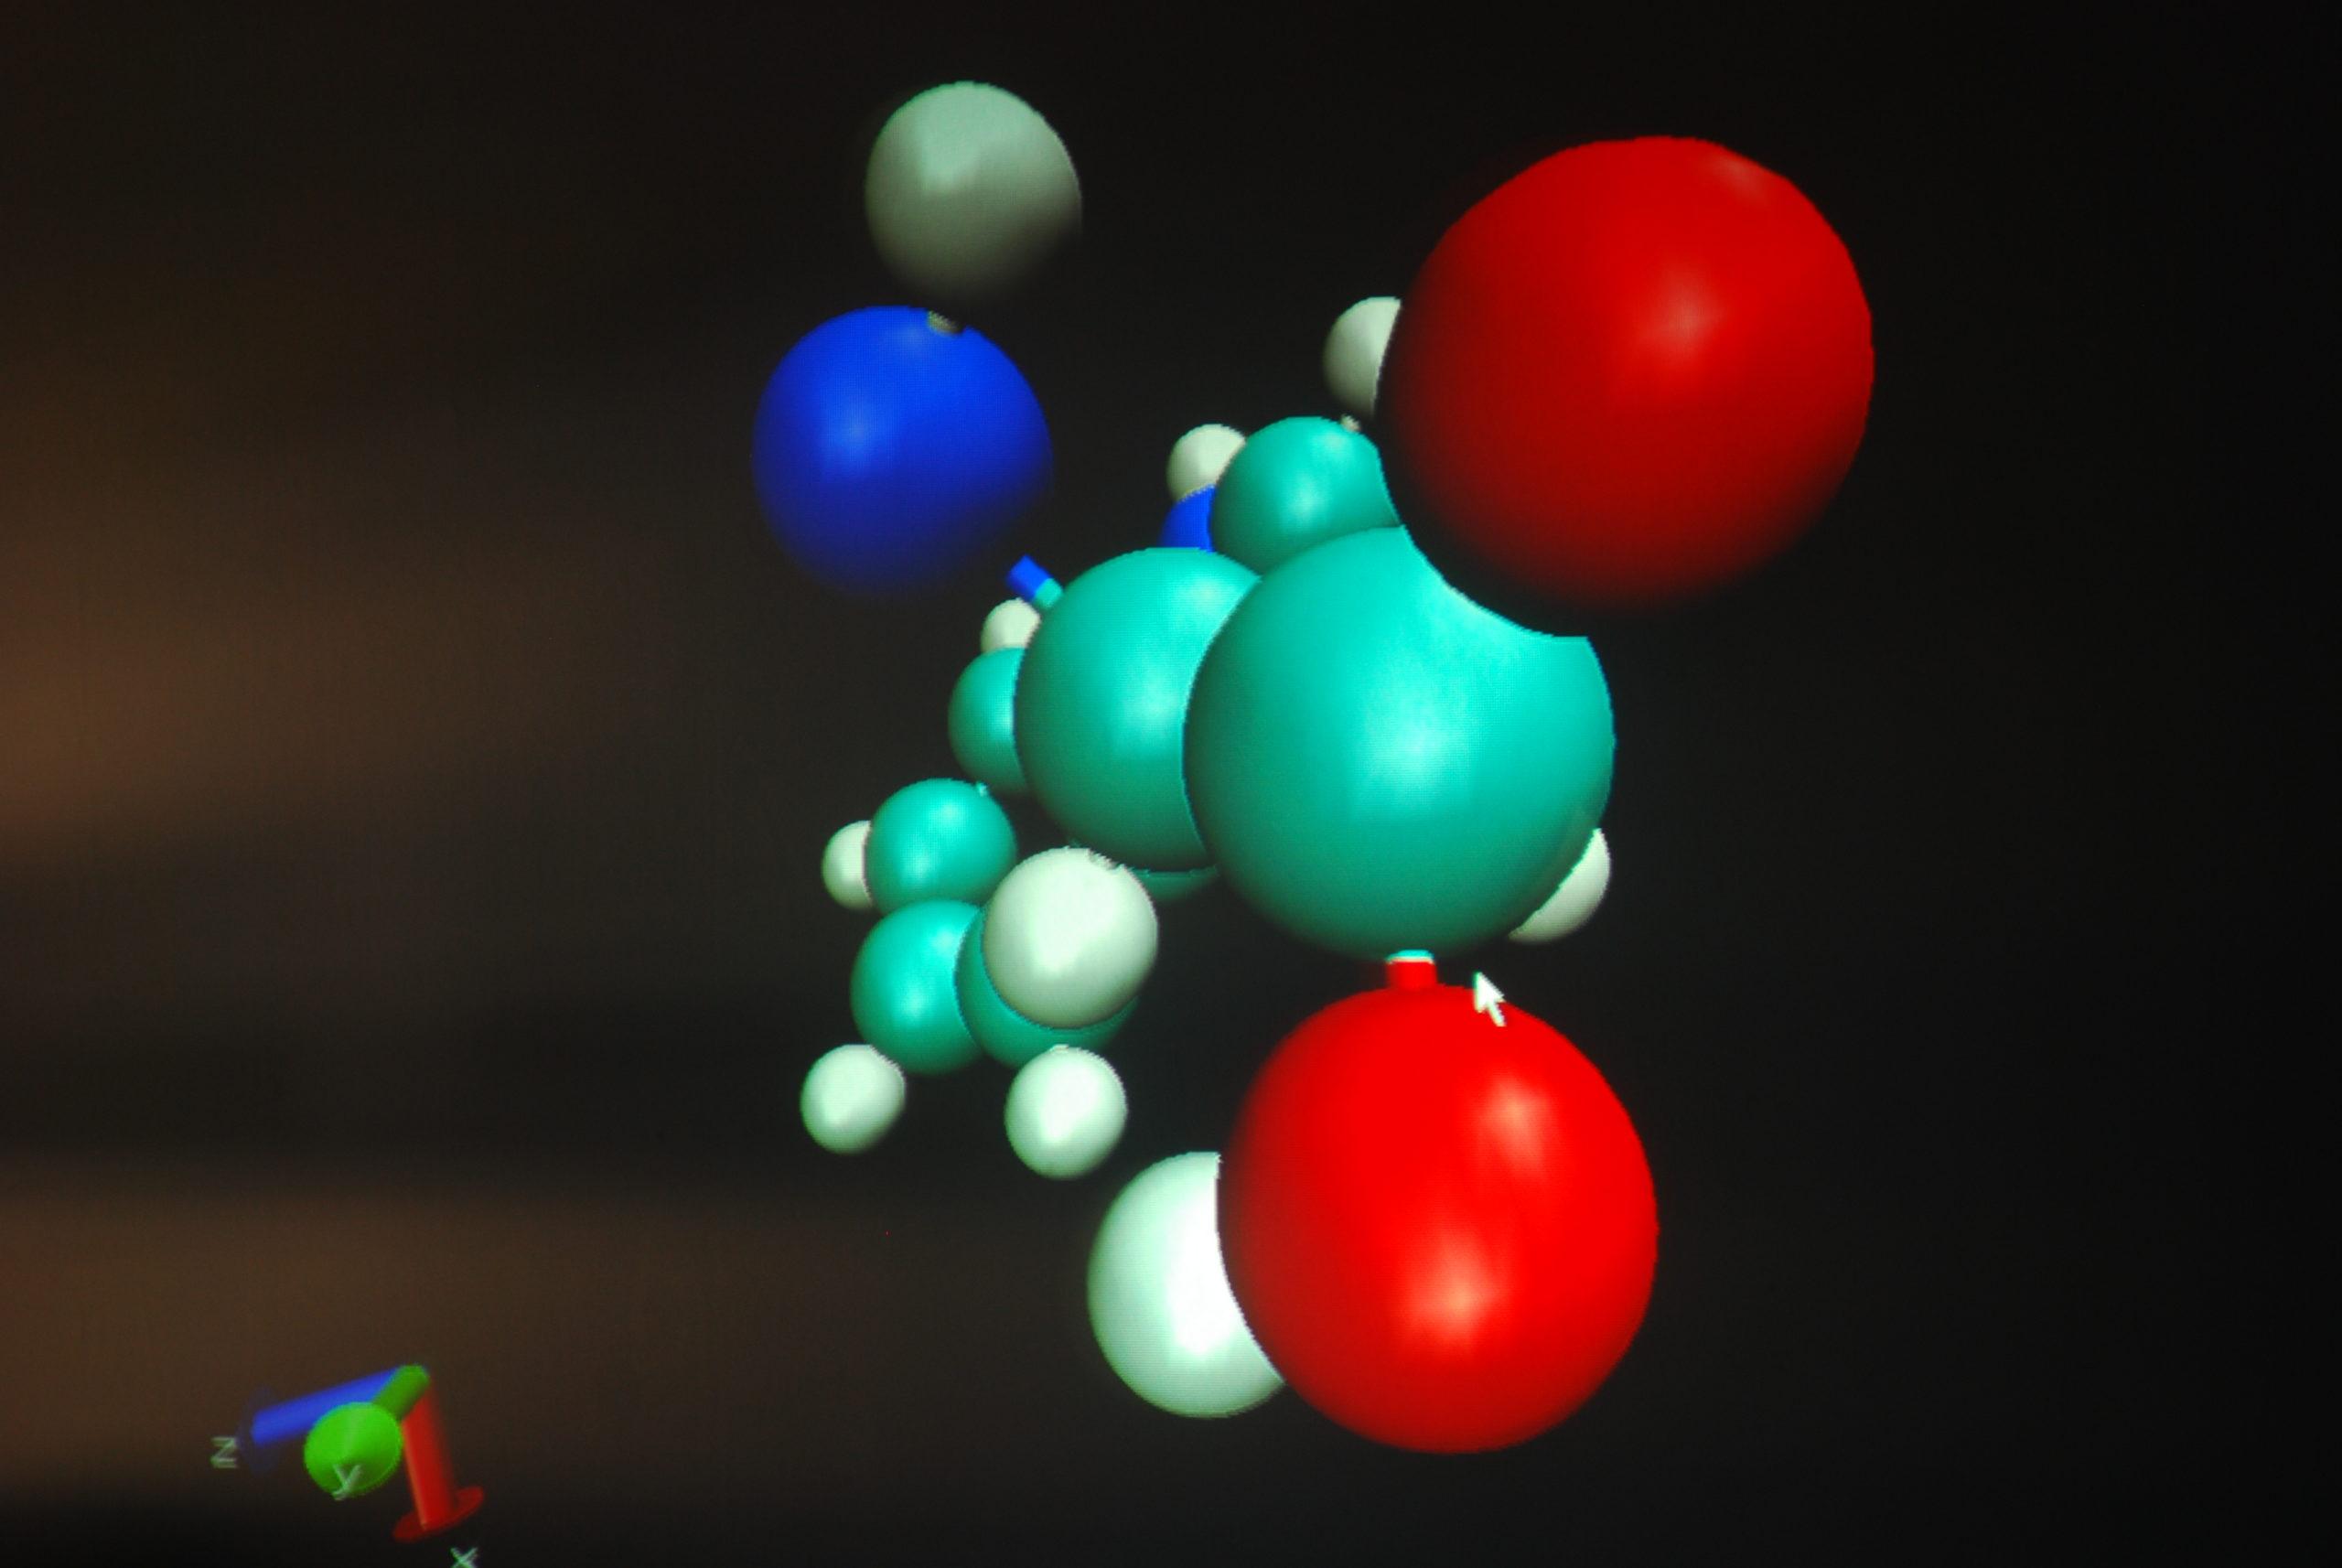 Simposio: HPC & BigData for Nanotechnology